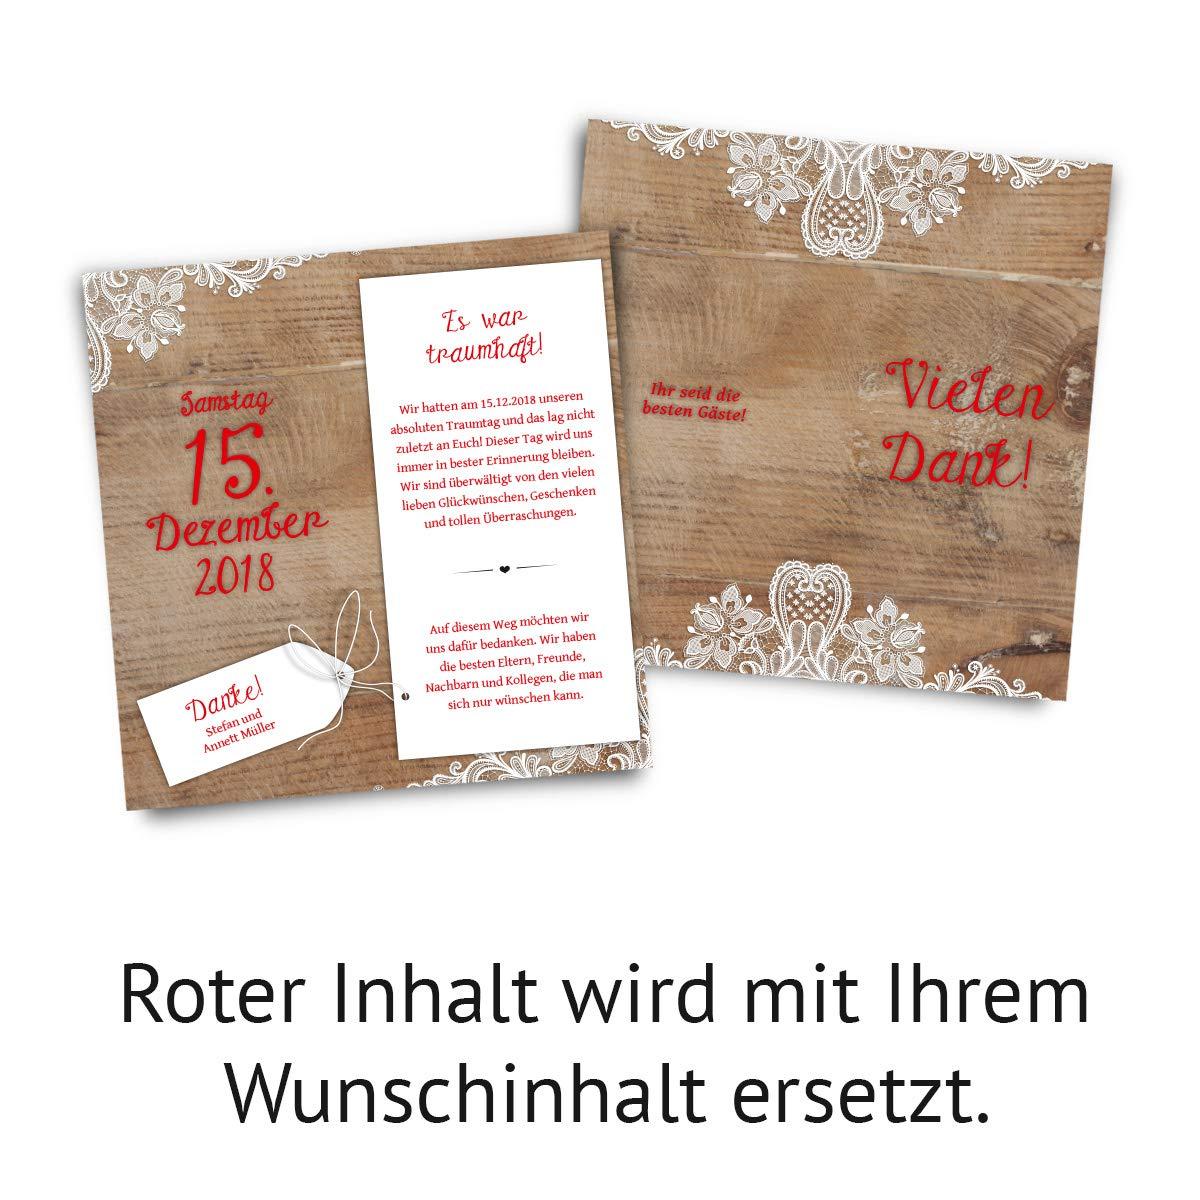 30 x hochzeit dankeskarten danksagungskarten danke din lang klappkarte rustikal mit weißer spitze amazon de bürobedarf schreibwaren